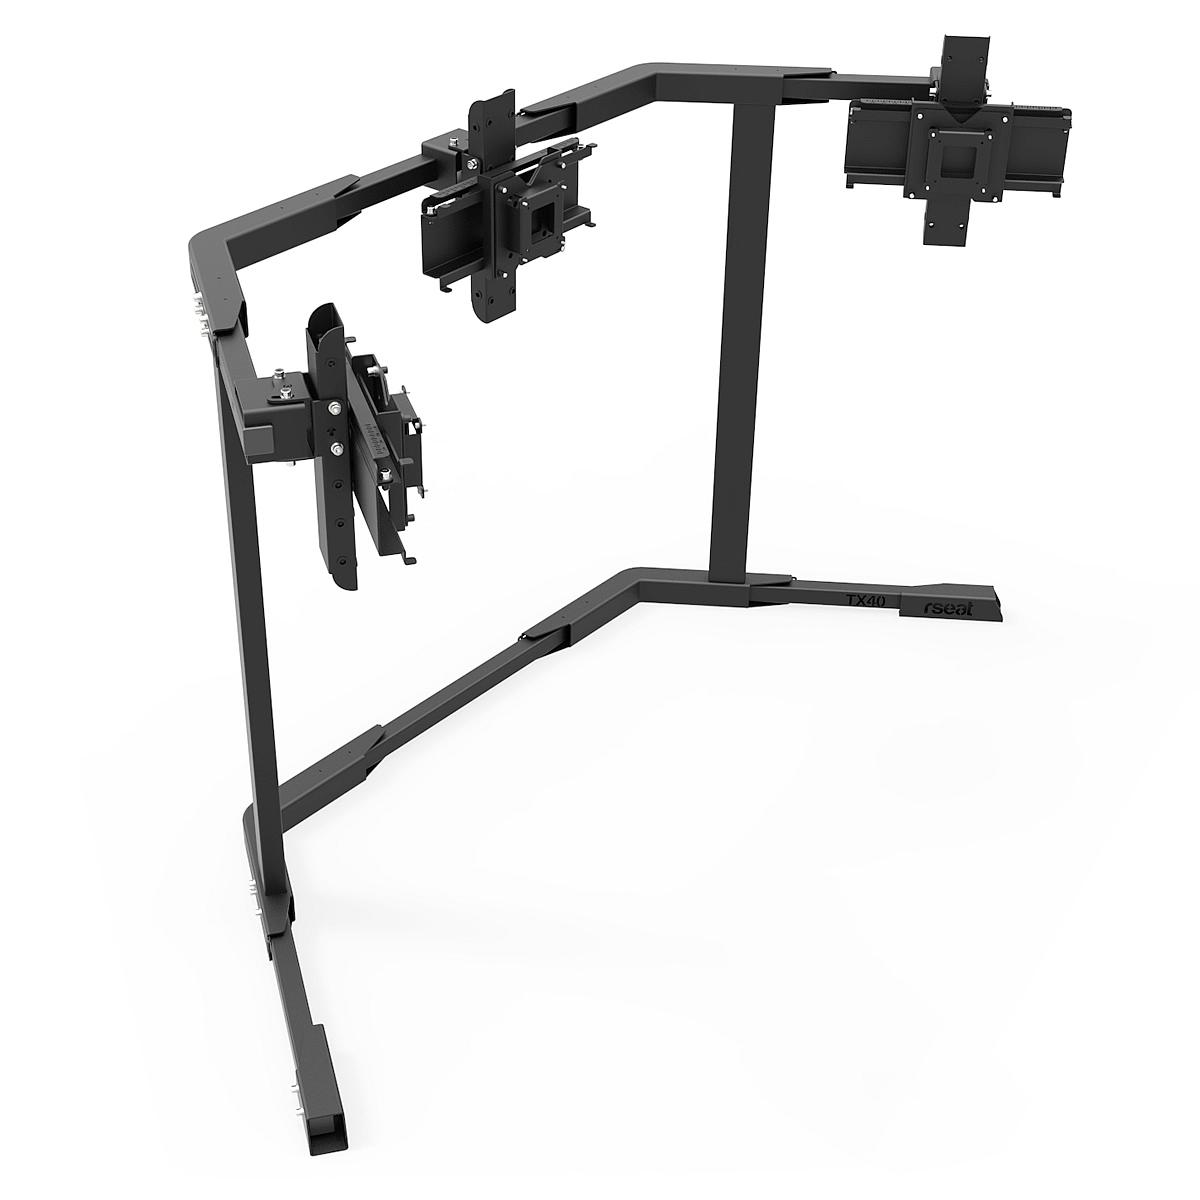 TX40 - Triple 27-40inch TV/Monitor Stand Black